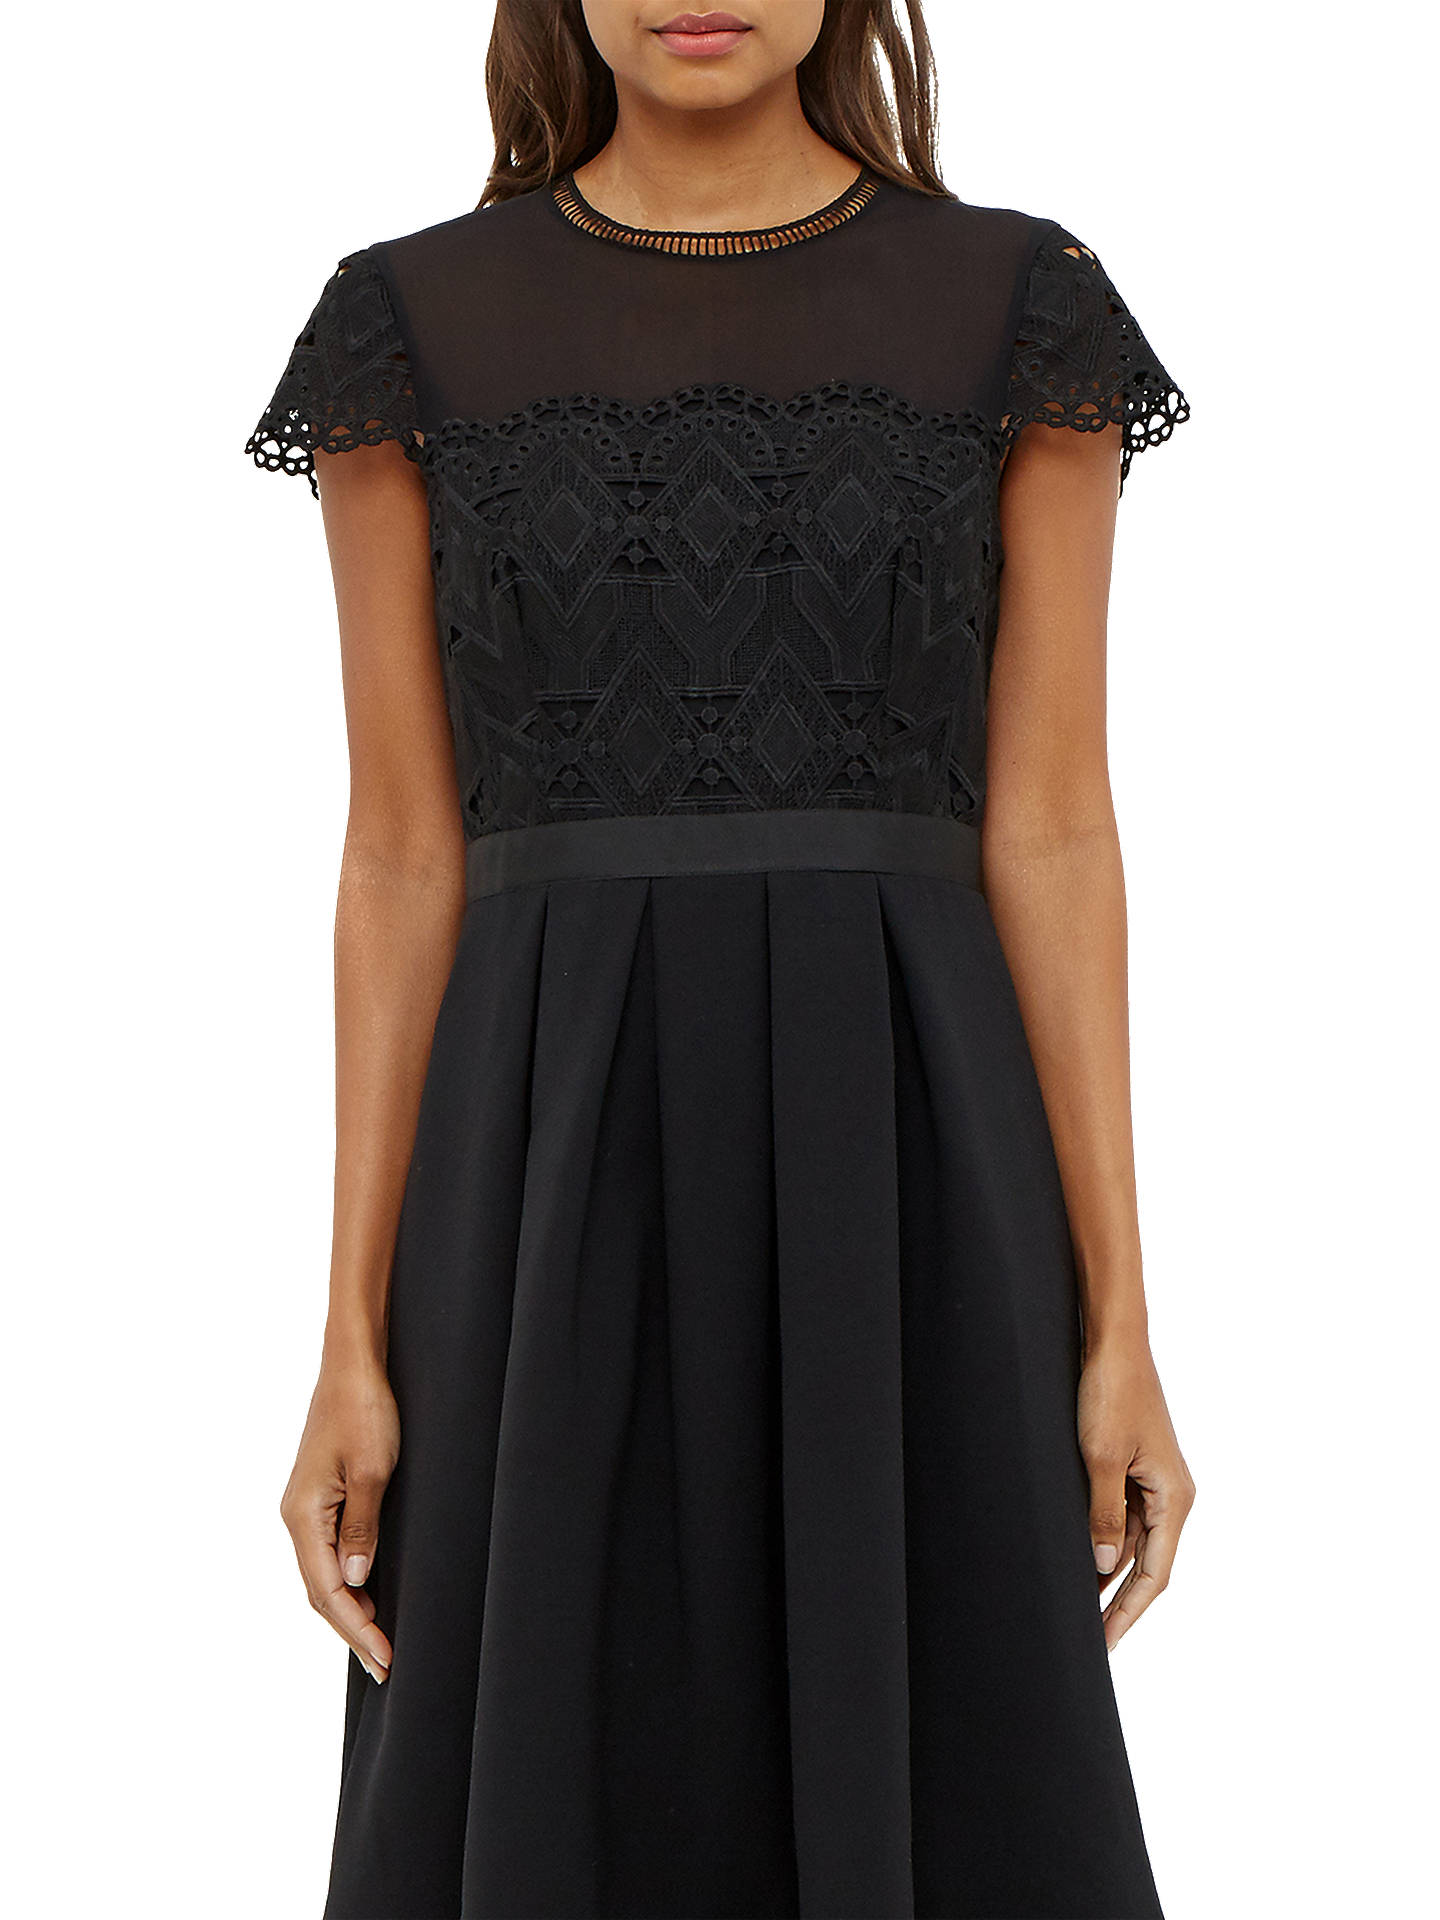 5cd0c802d785 ... Buy Ted Baker Frizay Lace Bodice Full Midi Dress